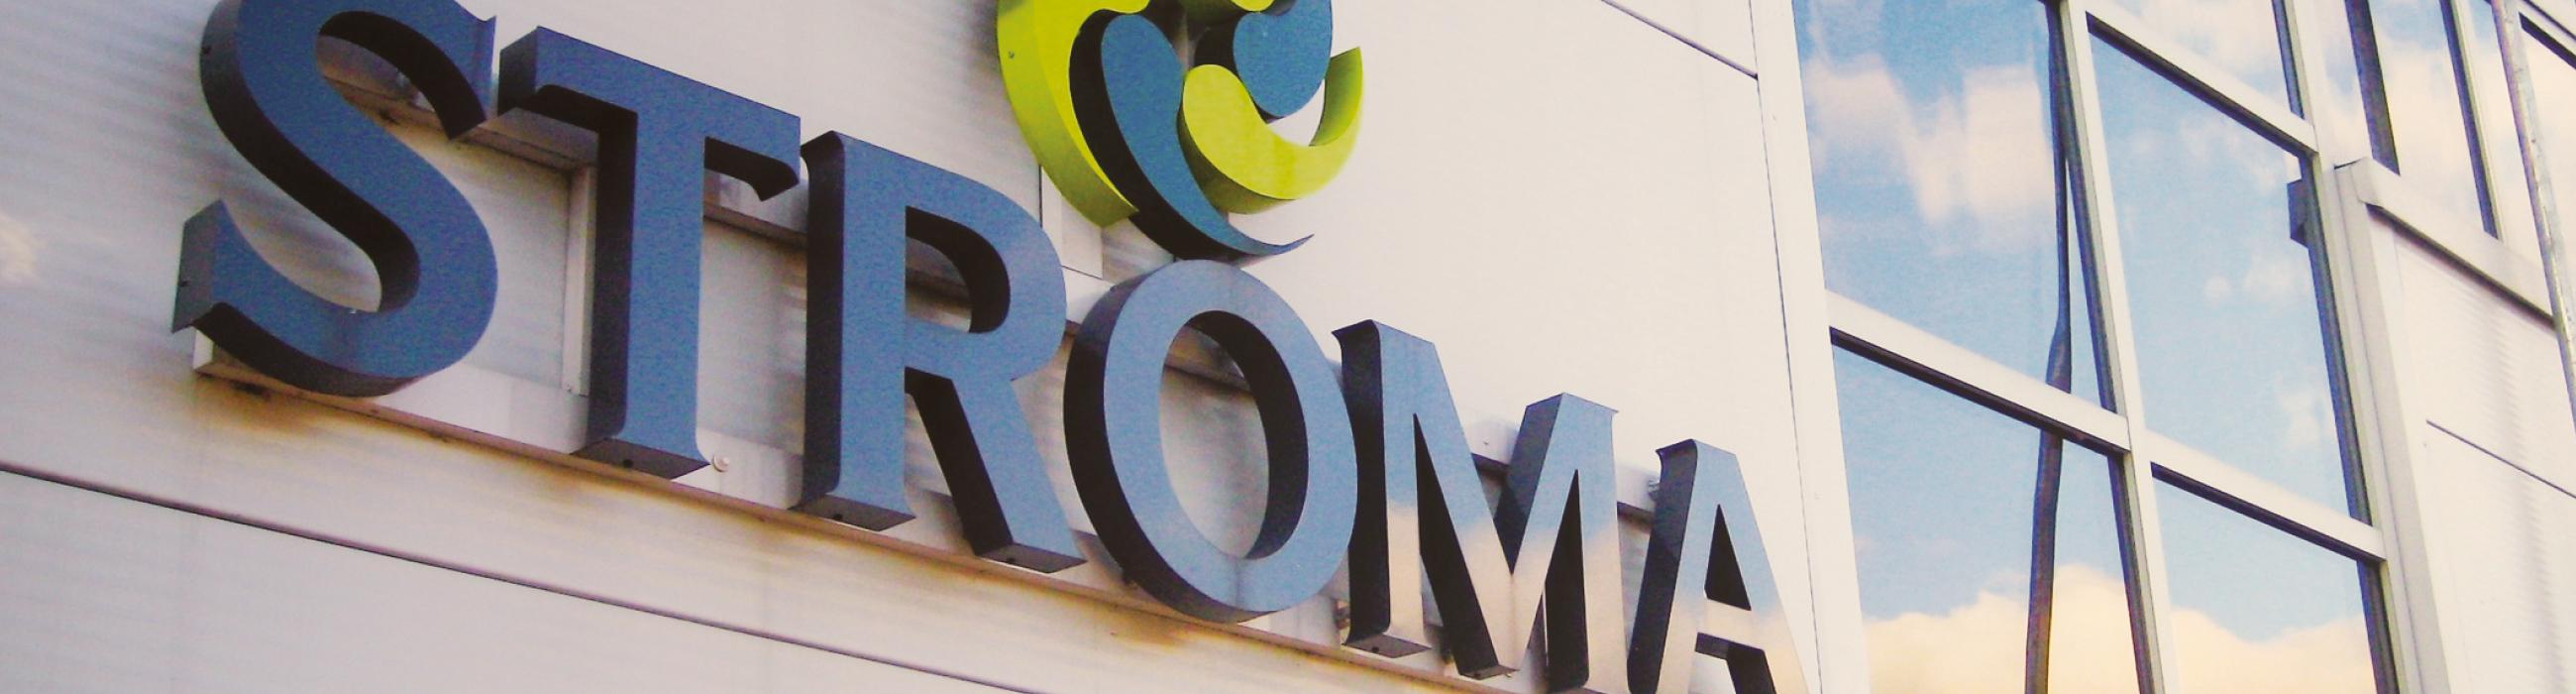 Stroma Careers